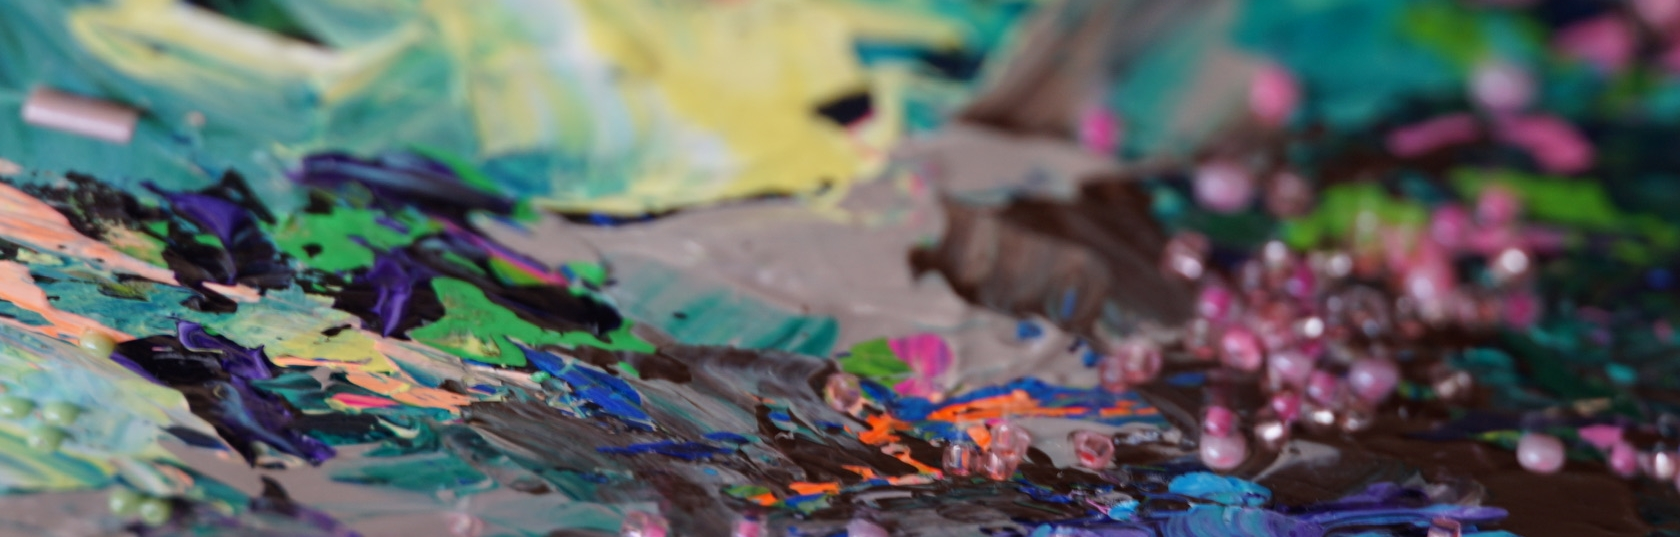 Header Spread Joy With Happy Art - Tierportraits © Silke Timpe 2020